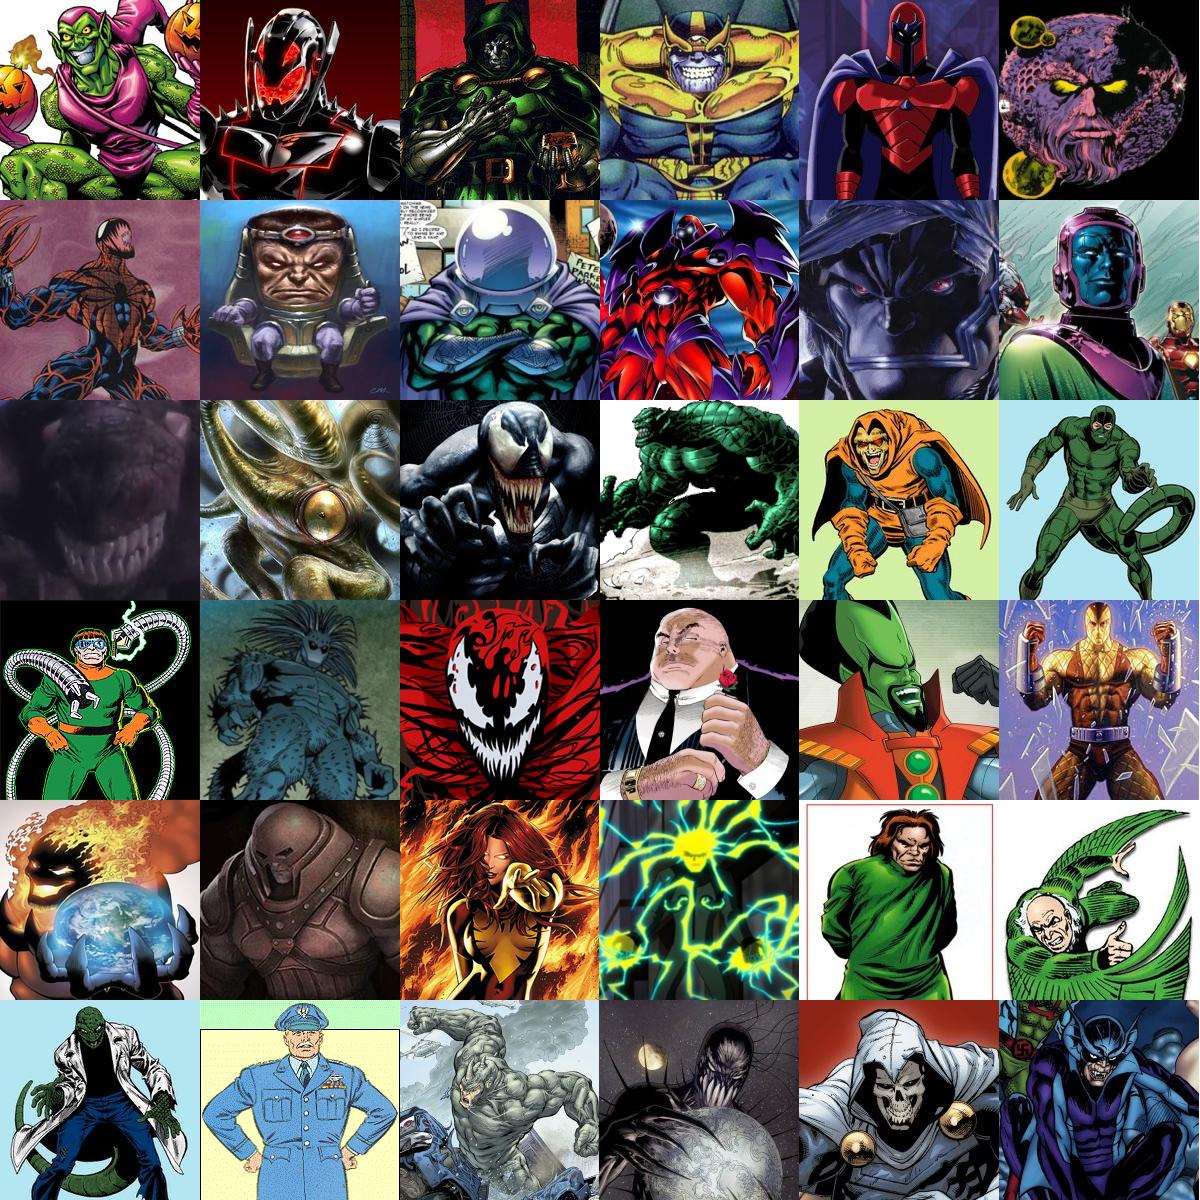 Marvel Super Villains Images amp Pictures Becuo